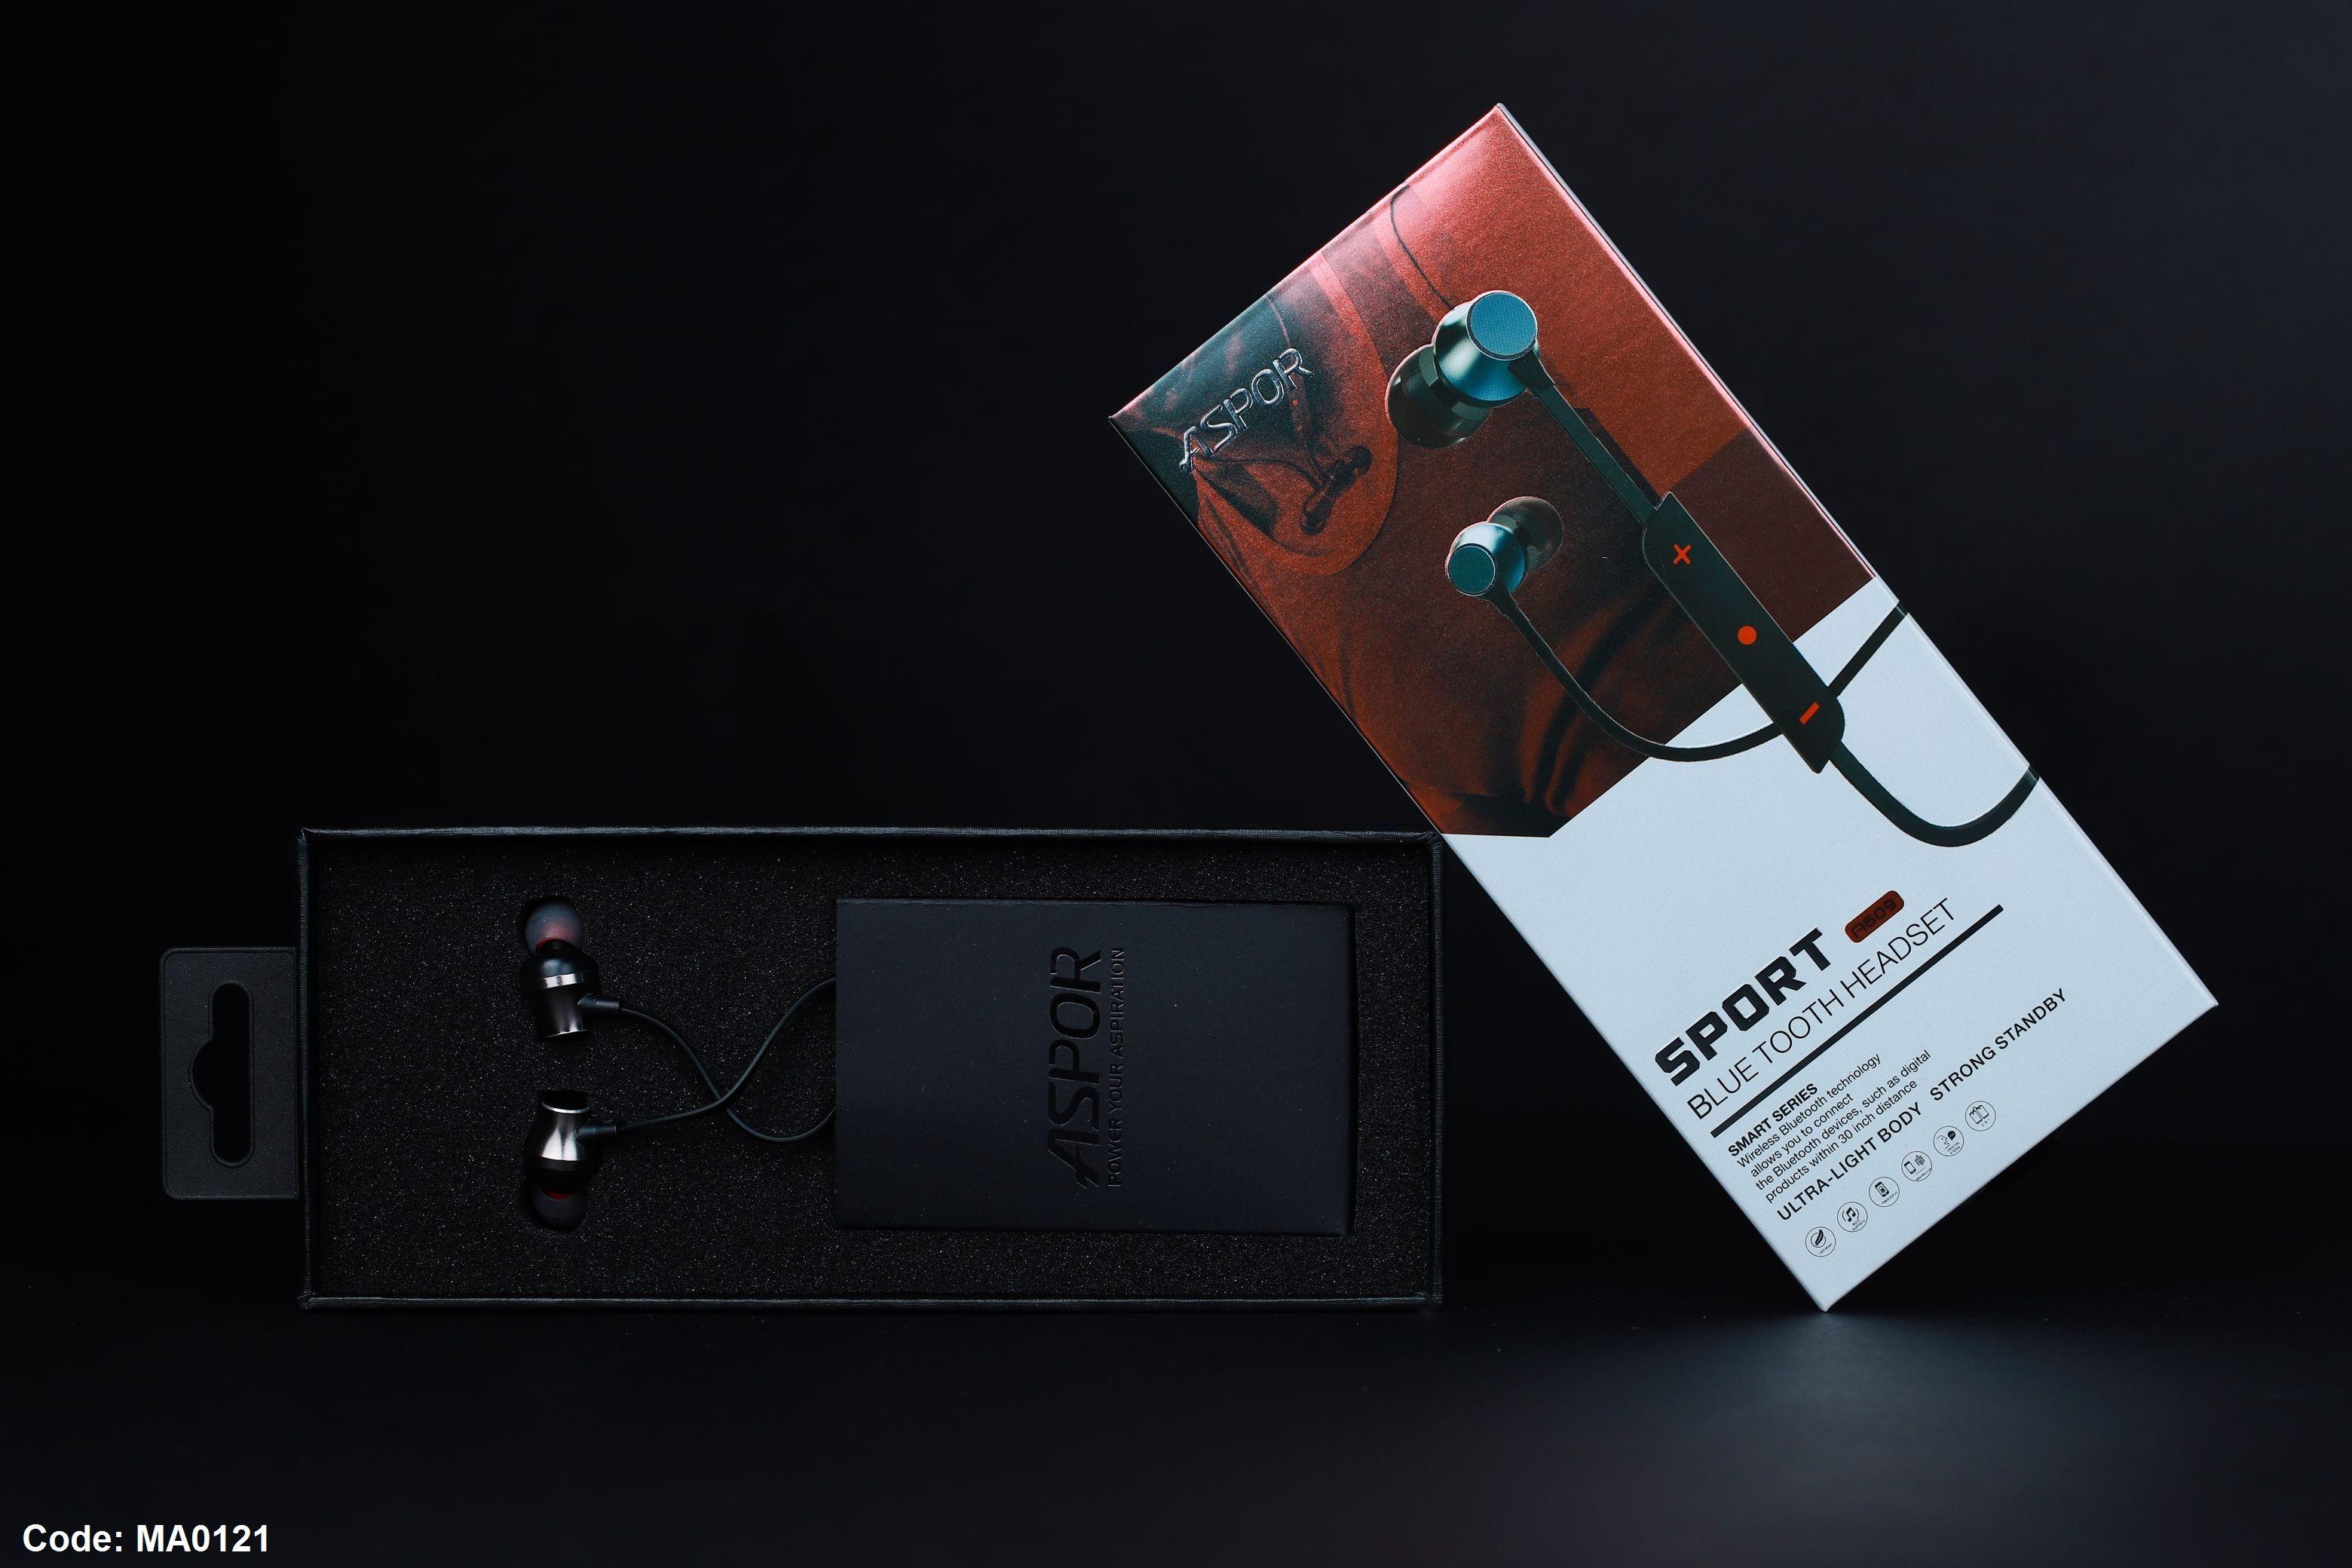 Bluetooth Headphones Aspor A609 بسعر230ج بدل من 300ج Phone Accessories Phone Electronic Products